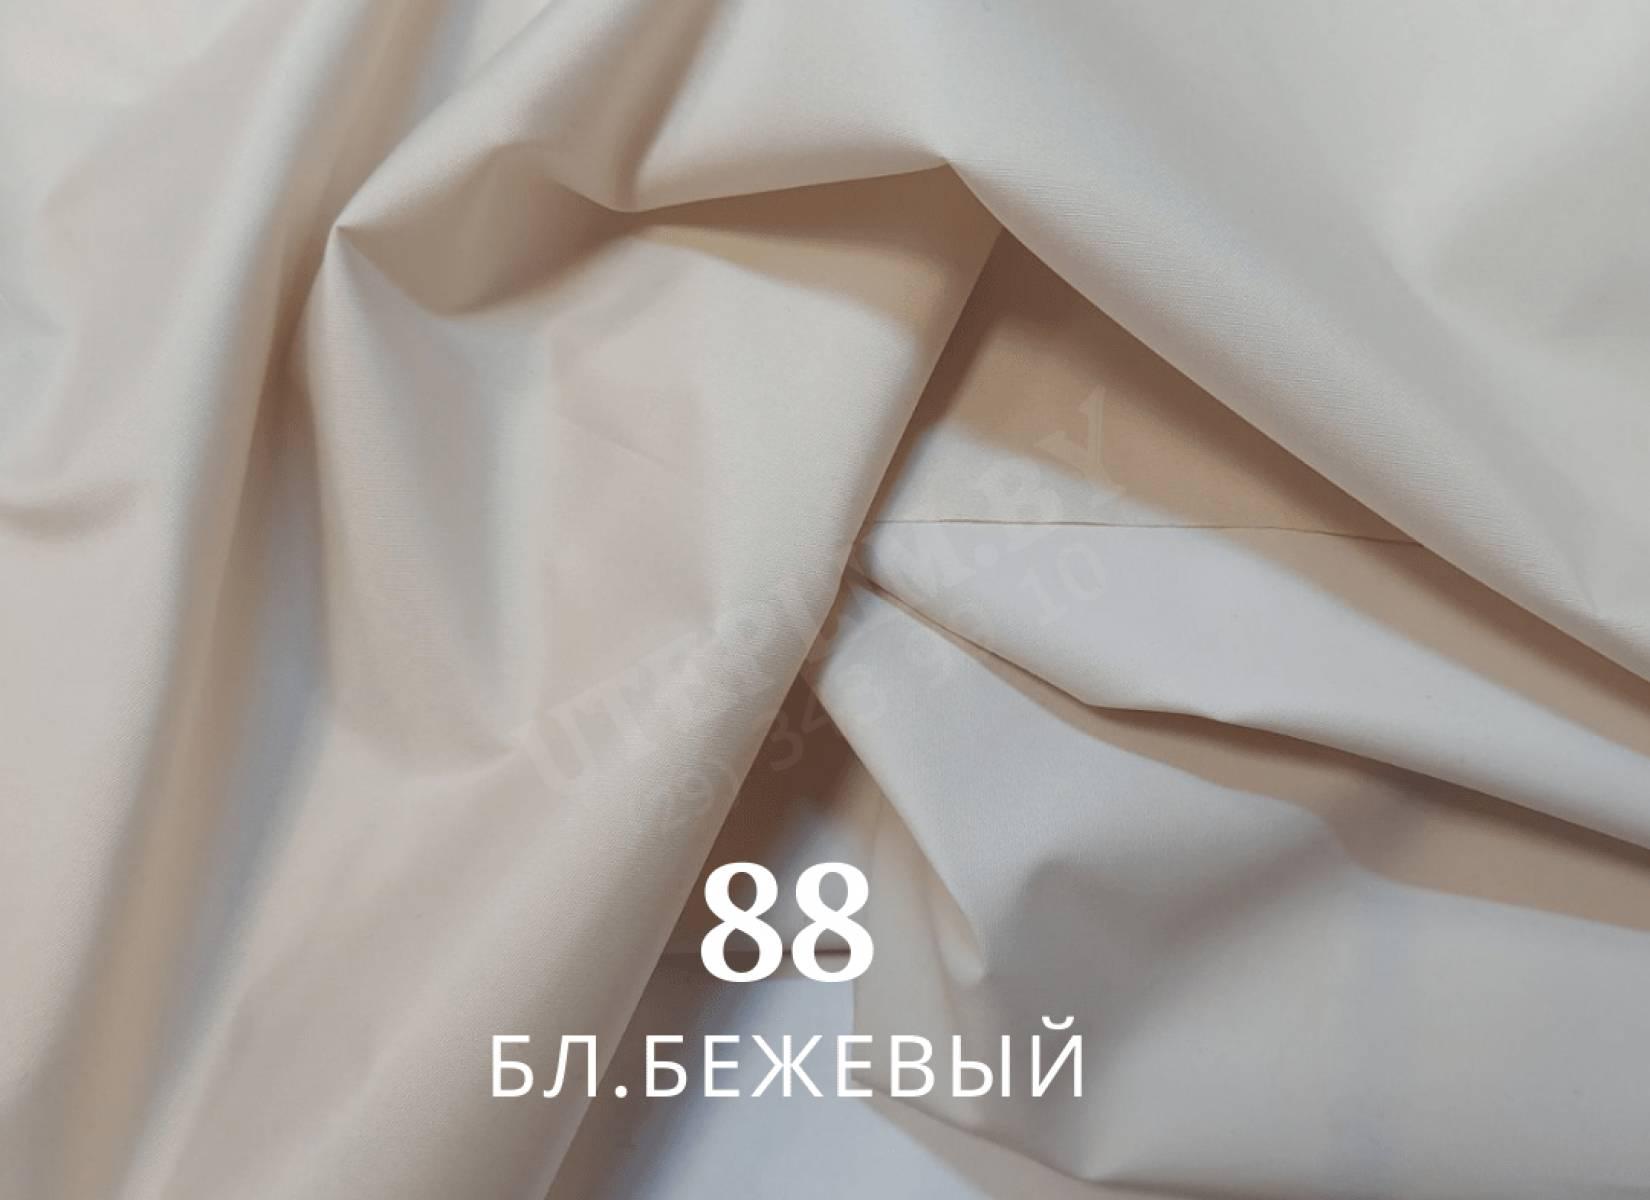 Дюспо - бл.бежевый